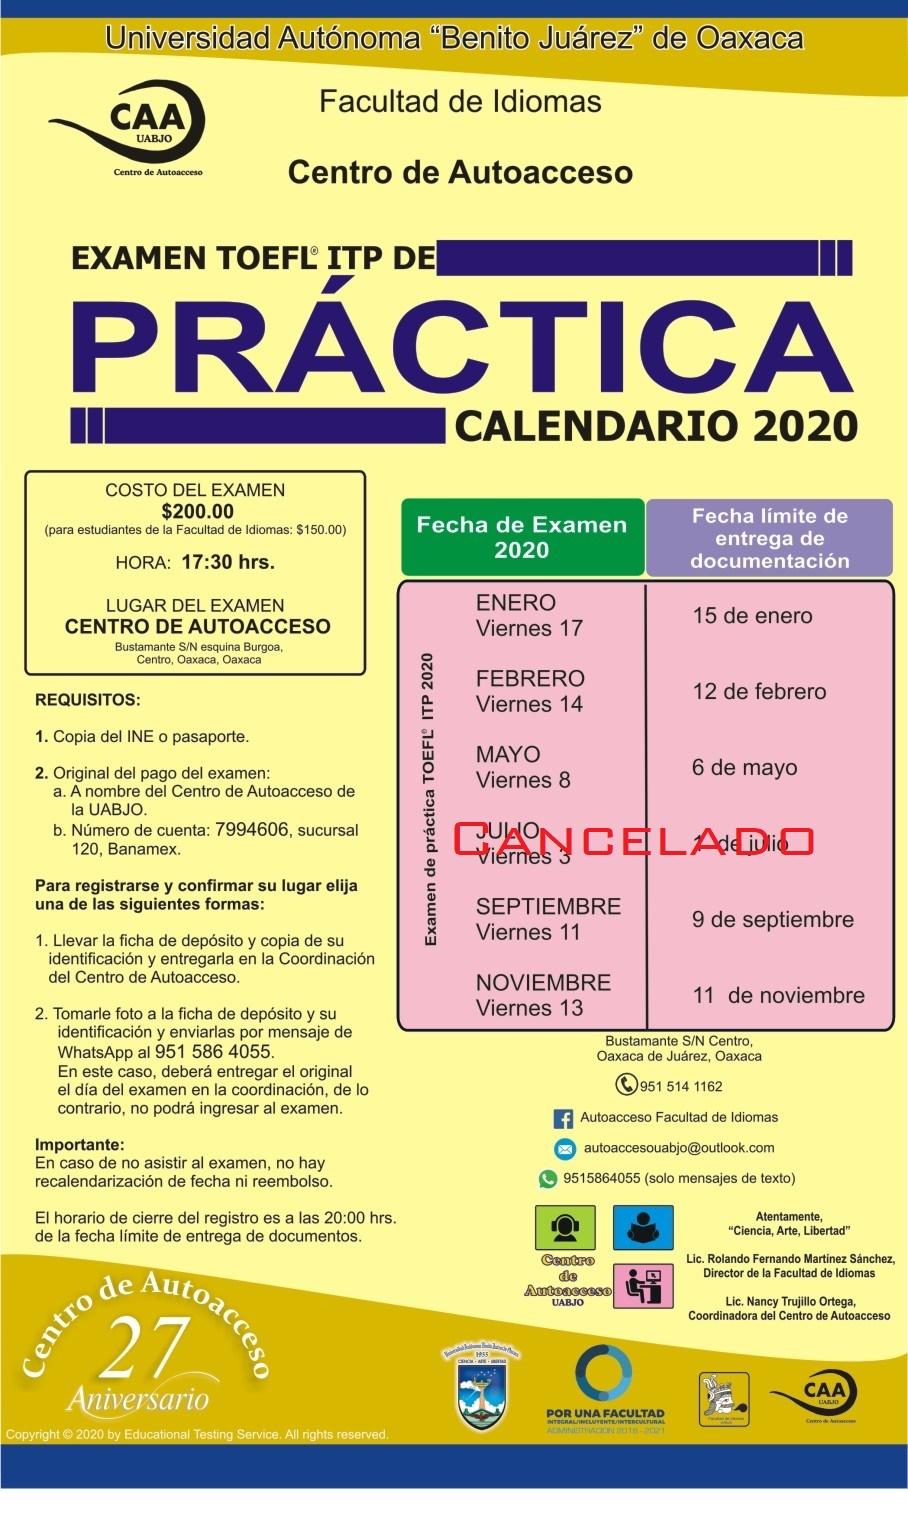 toefl práctica cancelado julio 2020